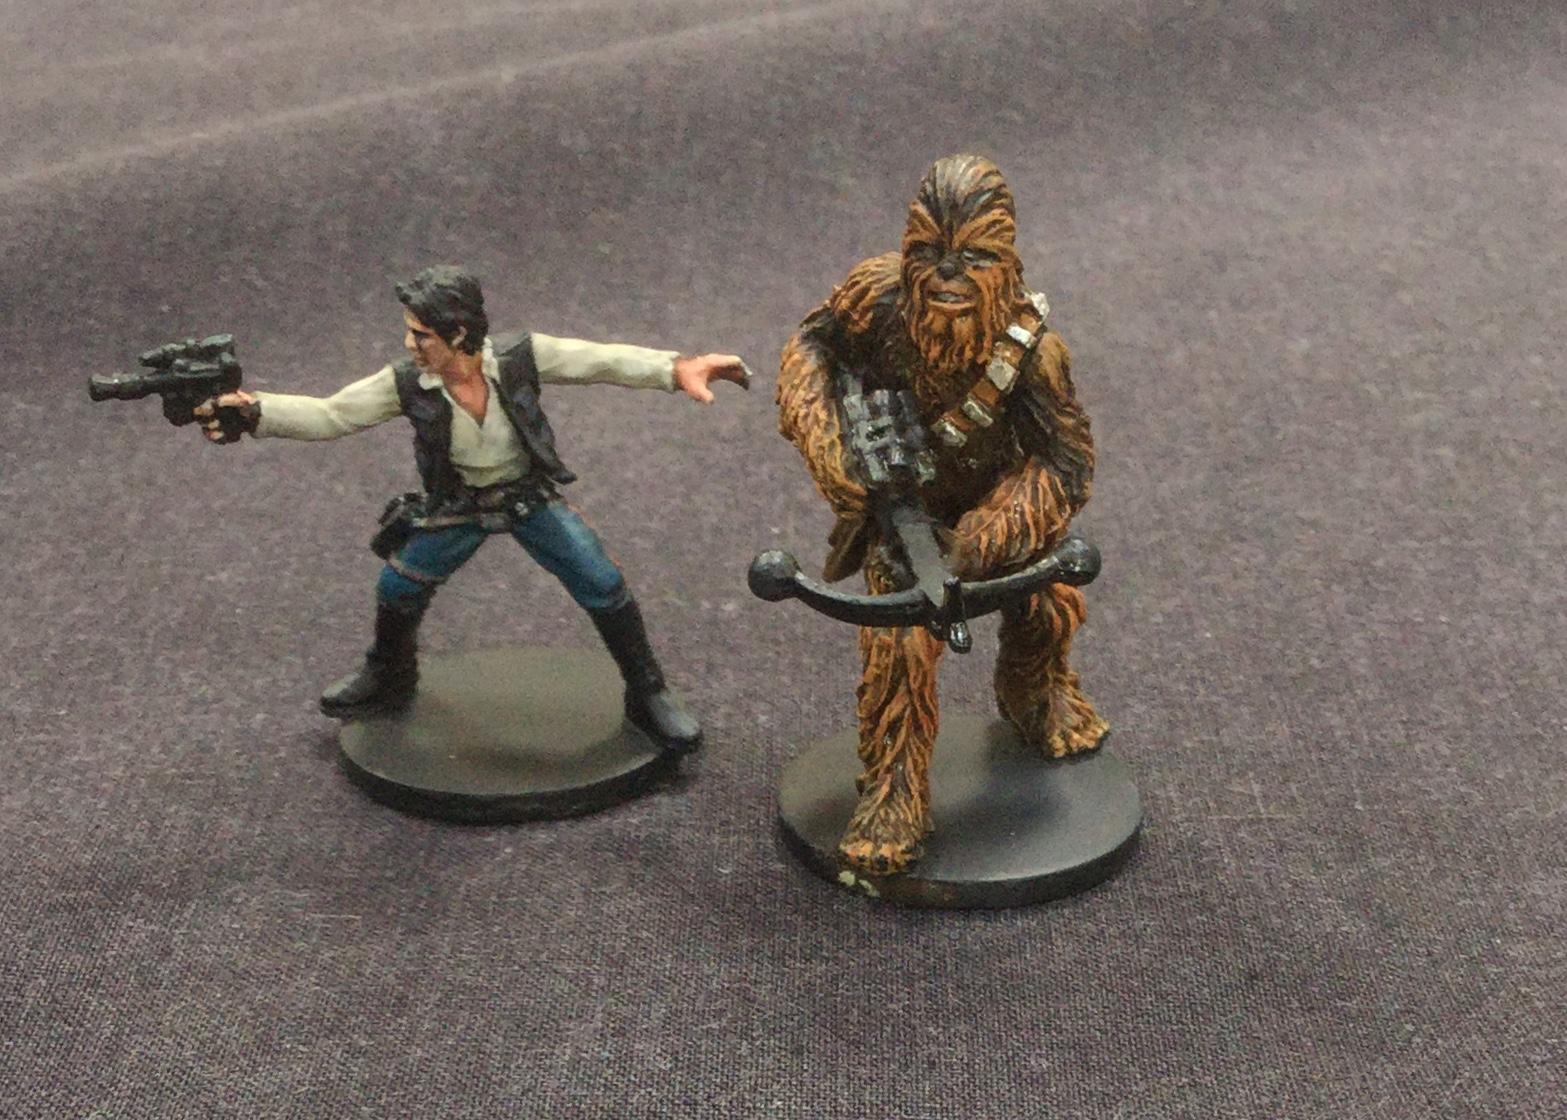 Chewbacca, Han Solo, Miniature, Star Wars